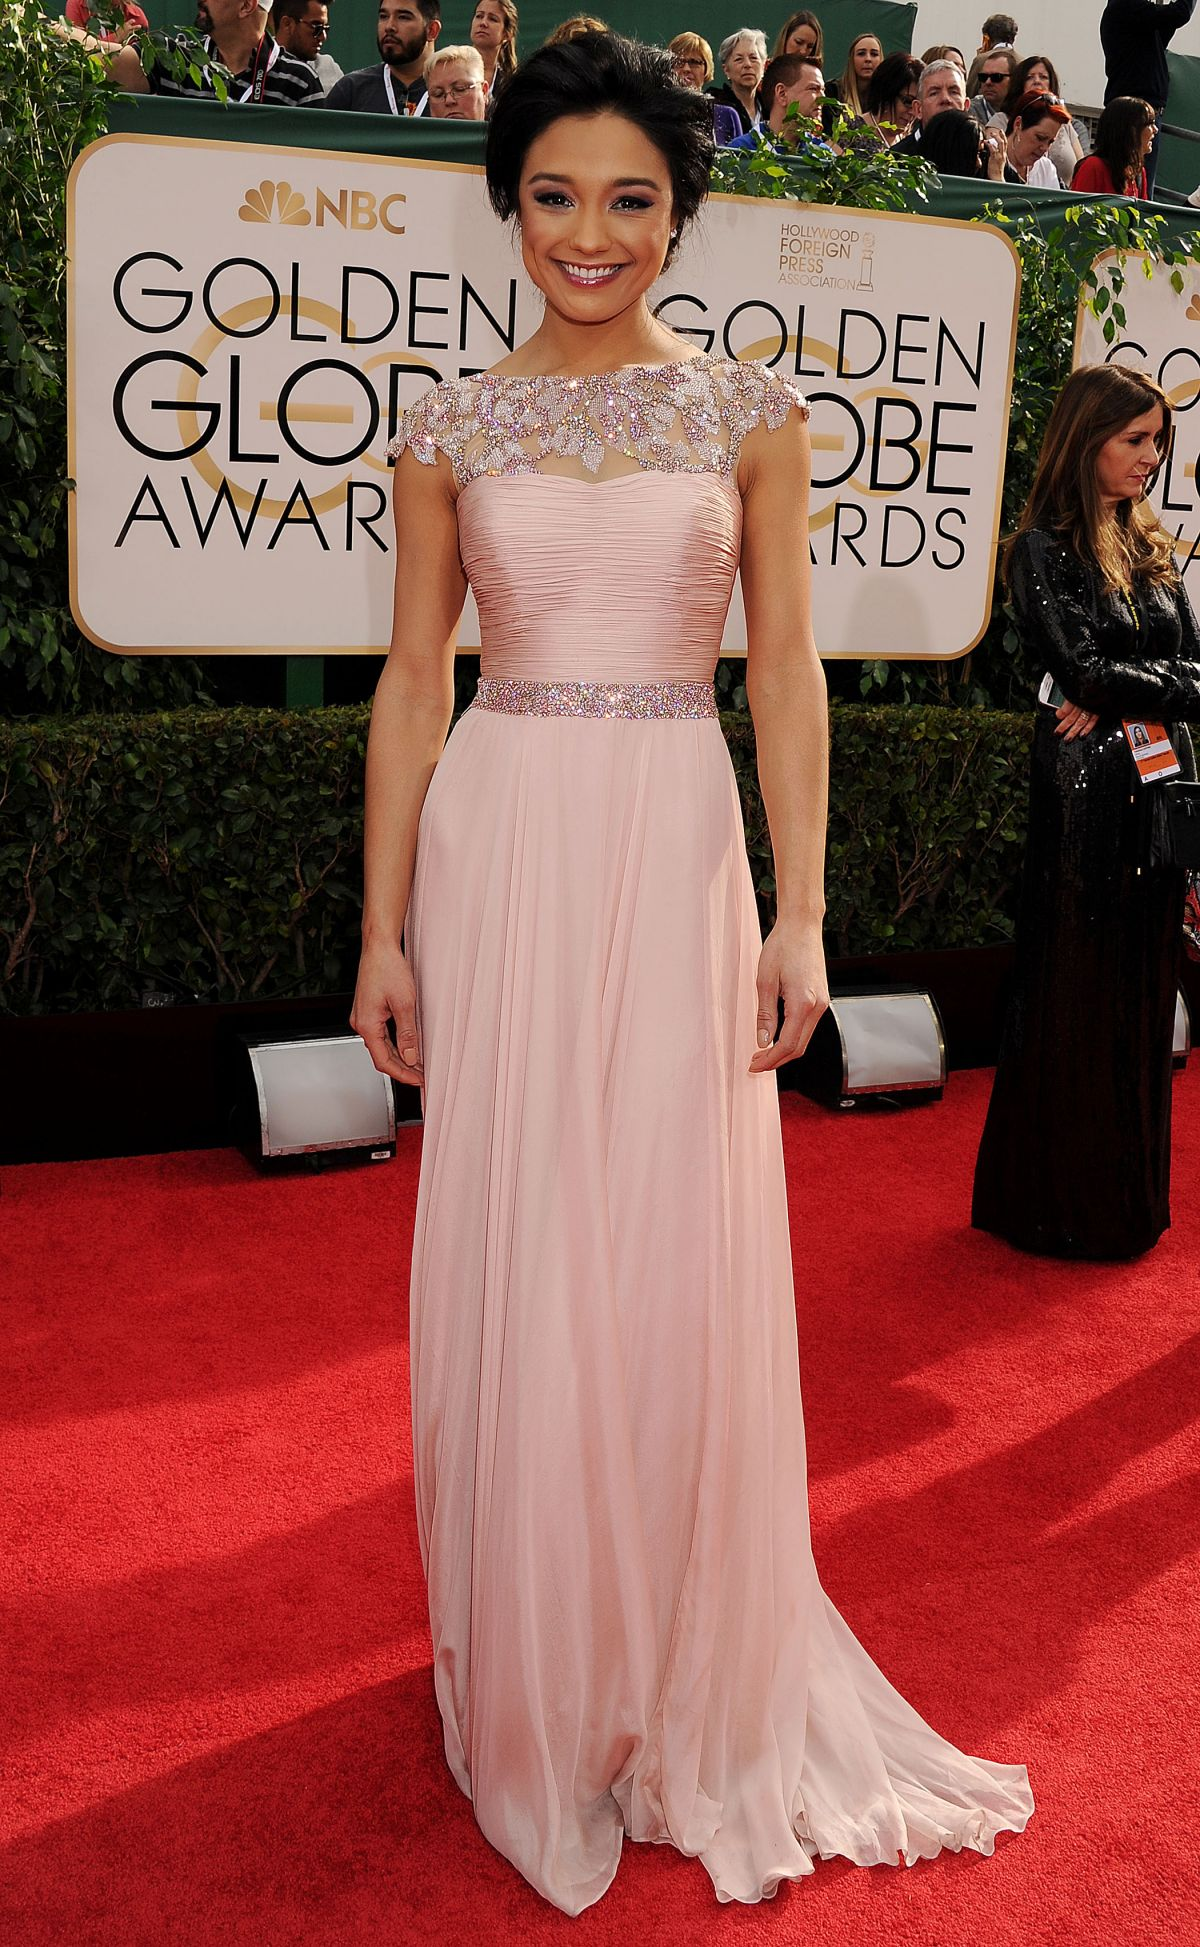 RACHEL SMITH at 71st Annual Golden Globe Awards